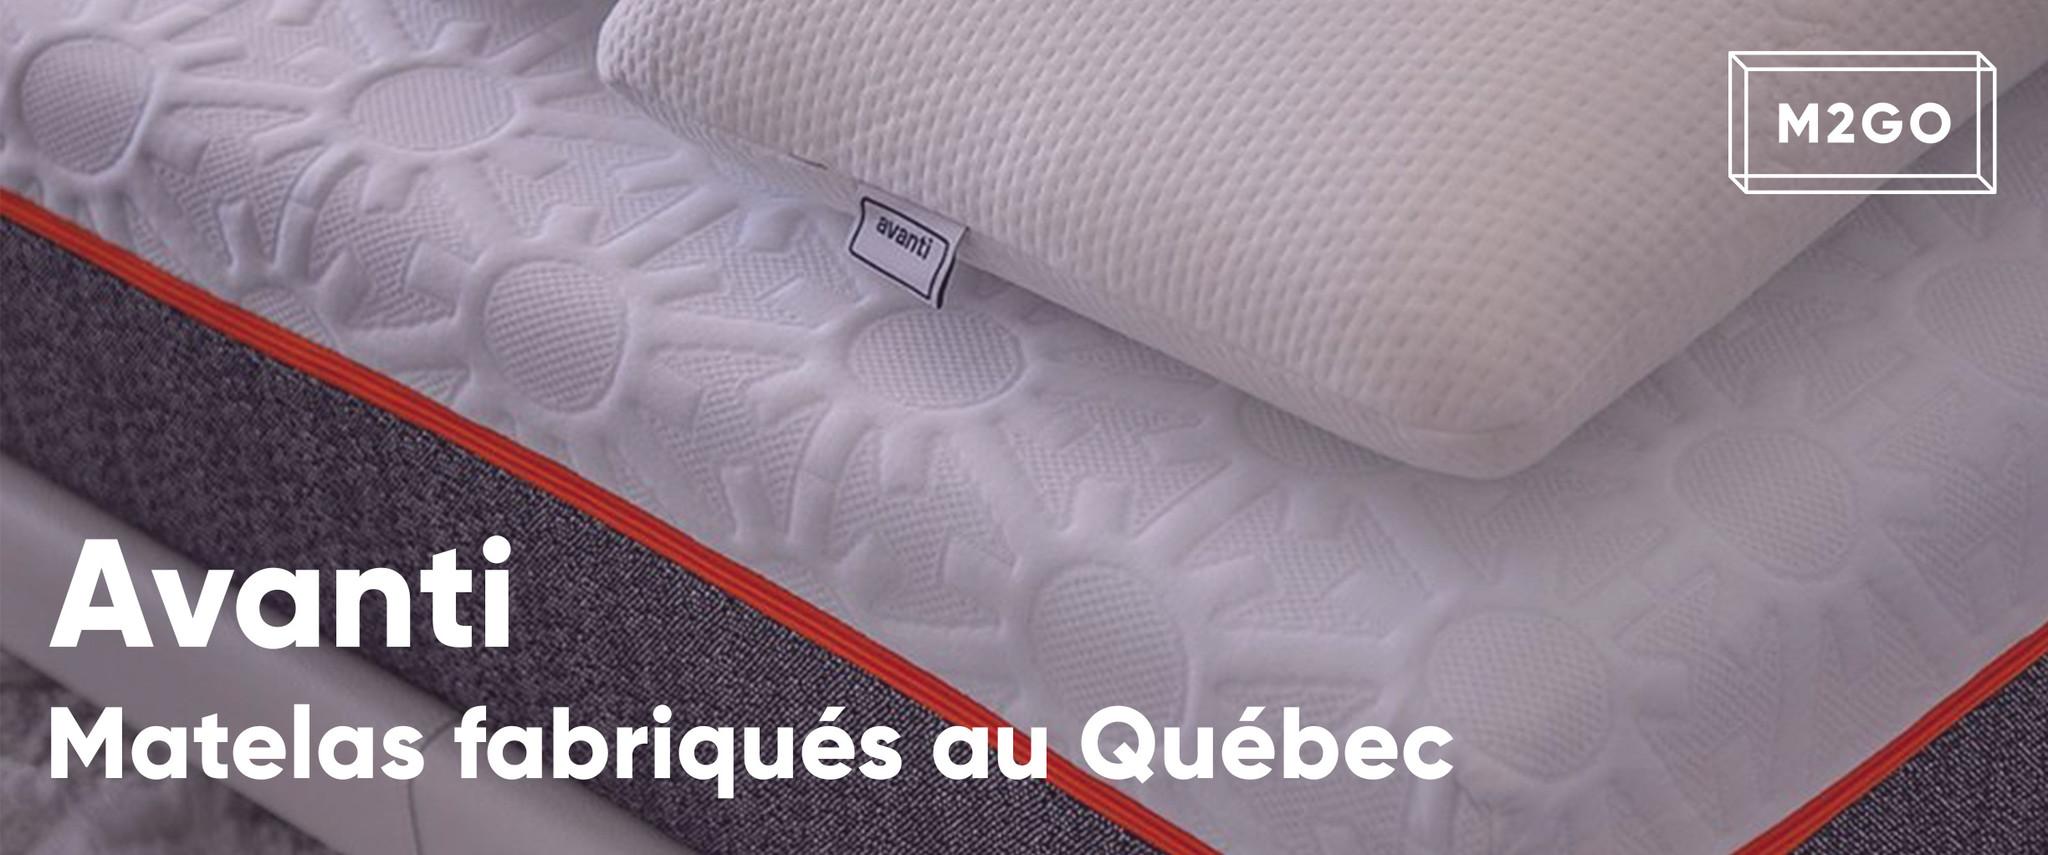 Avanti : Matelas fabriqués au Québec